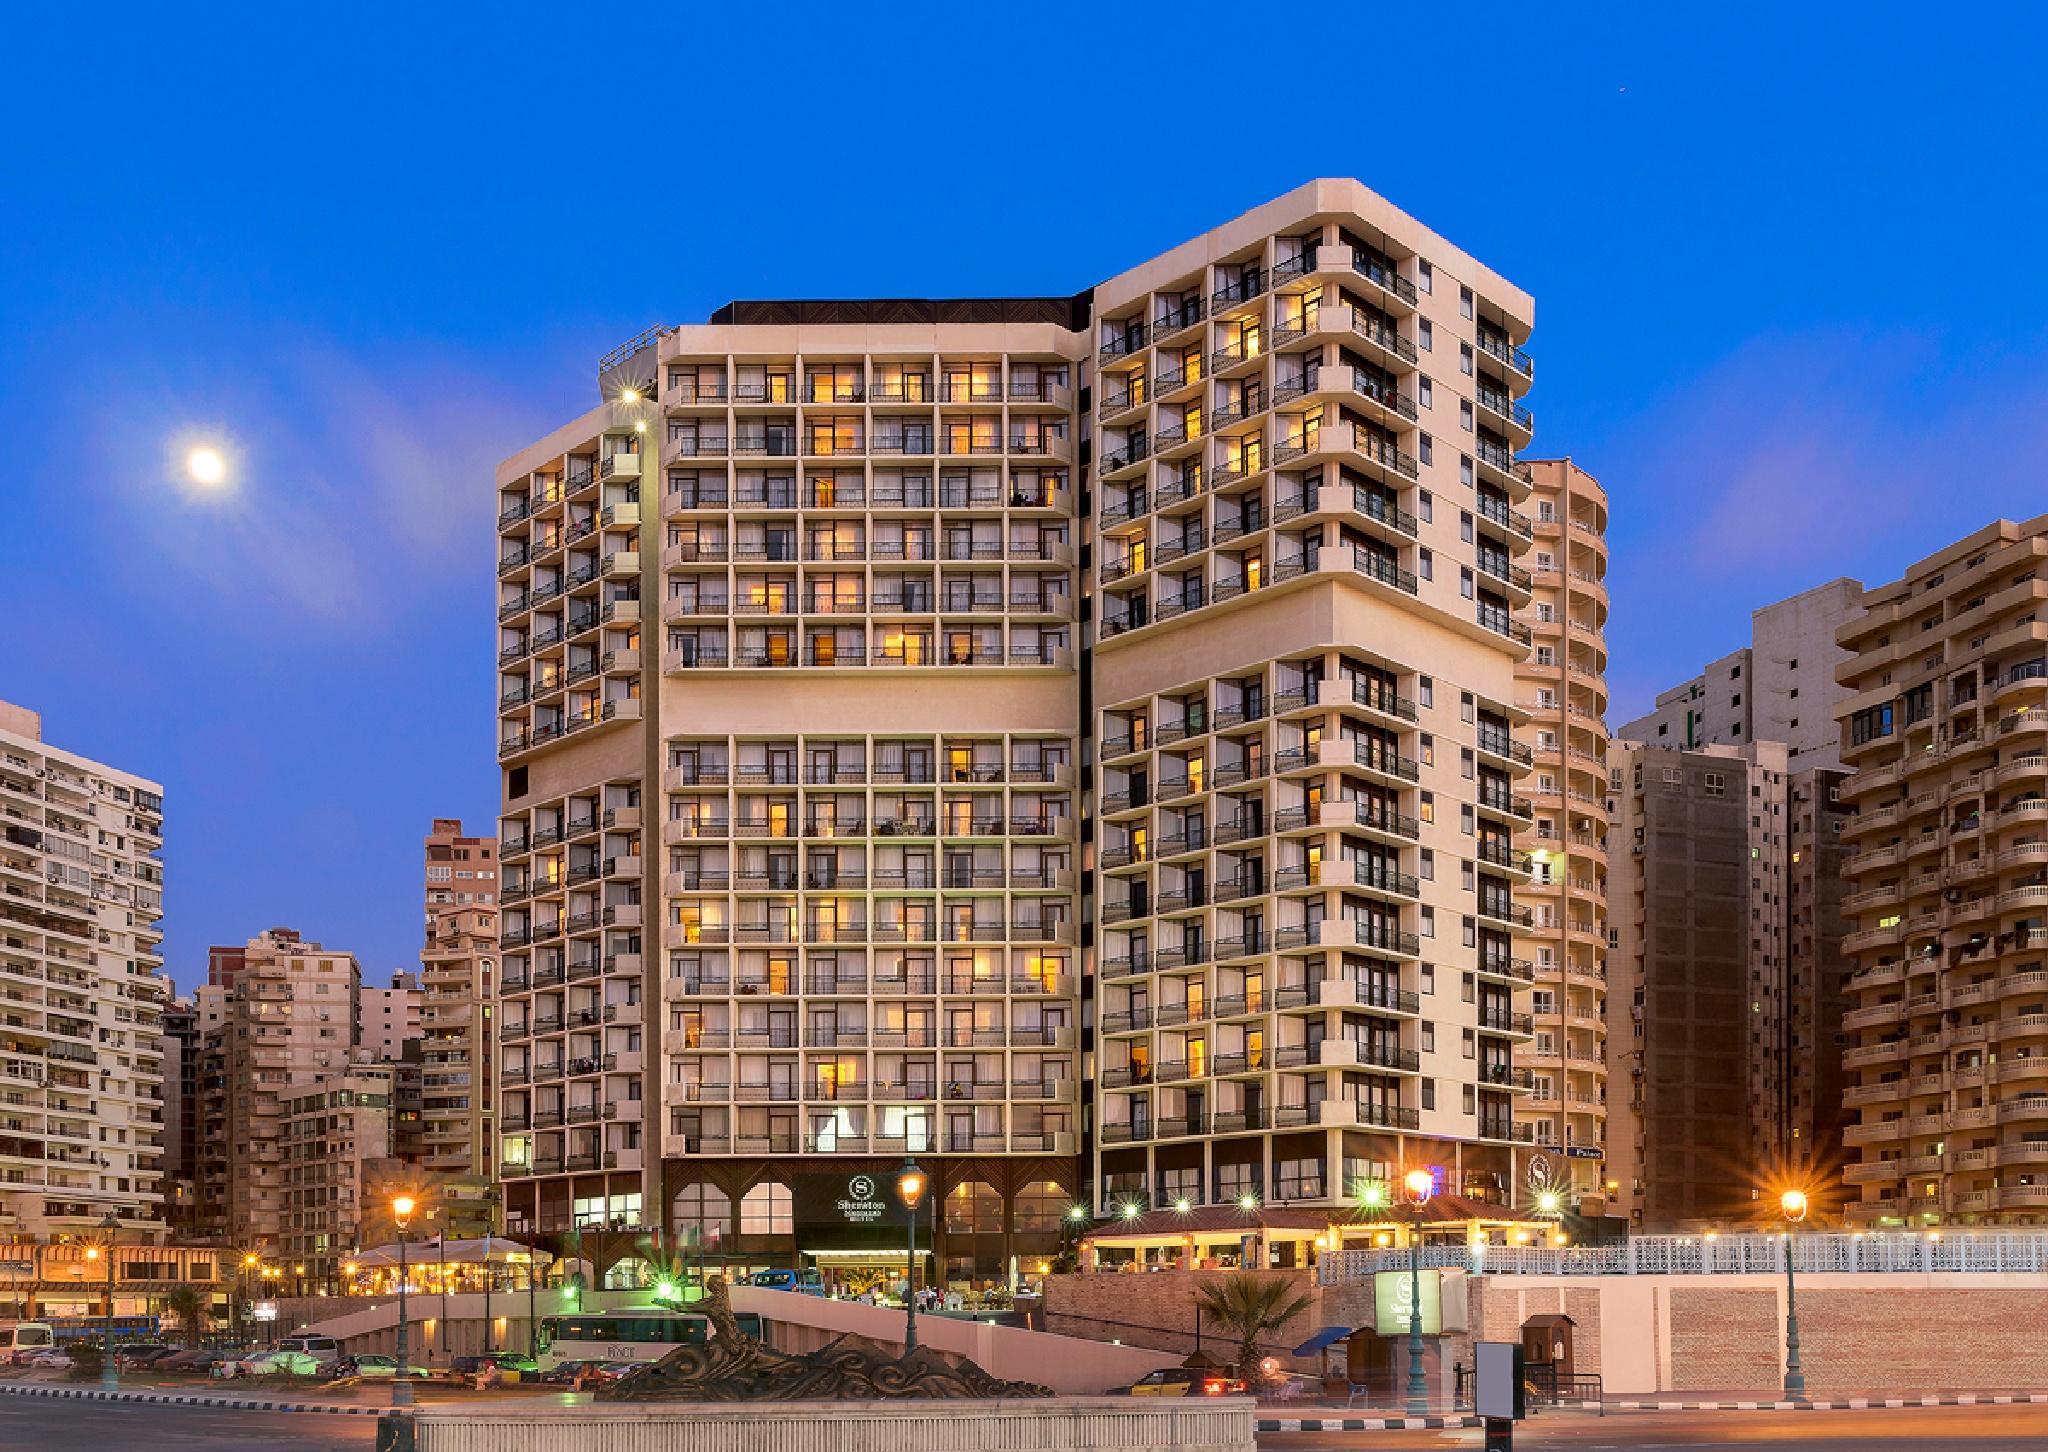 Sheraton Montazah Hotel Facade by Jaguarjj